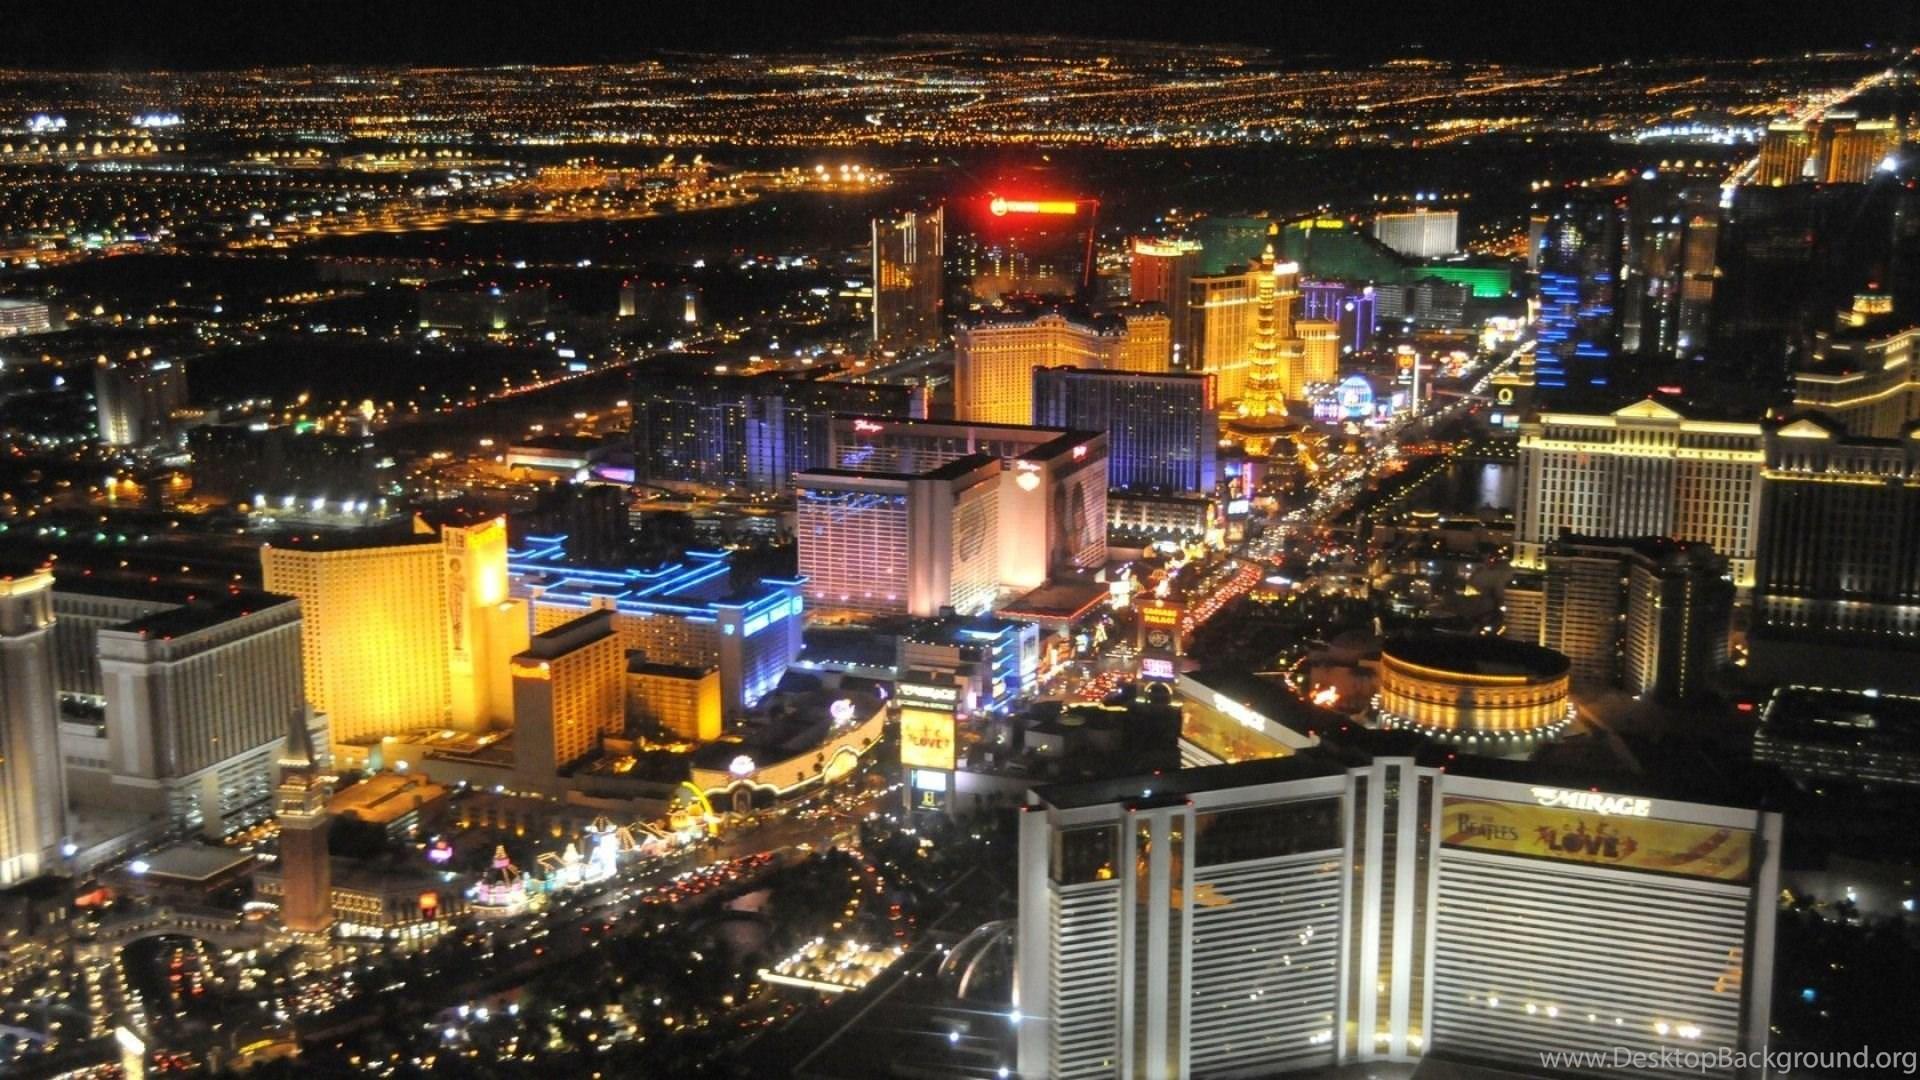 Download Wallpapers 1920x1080 Las Vegas Nevada Night Road Full